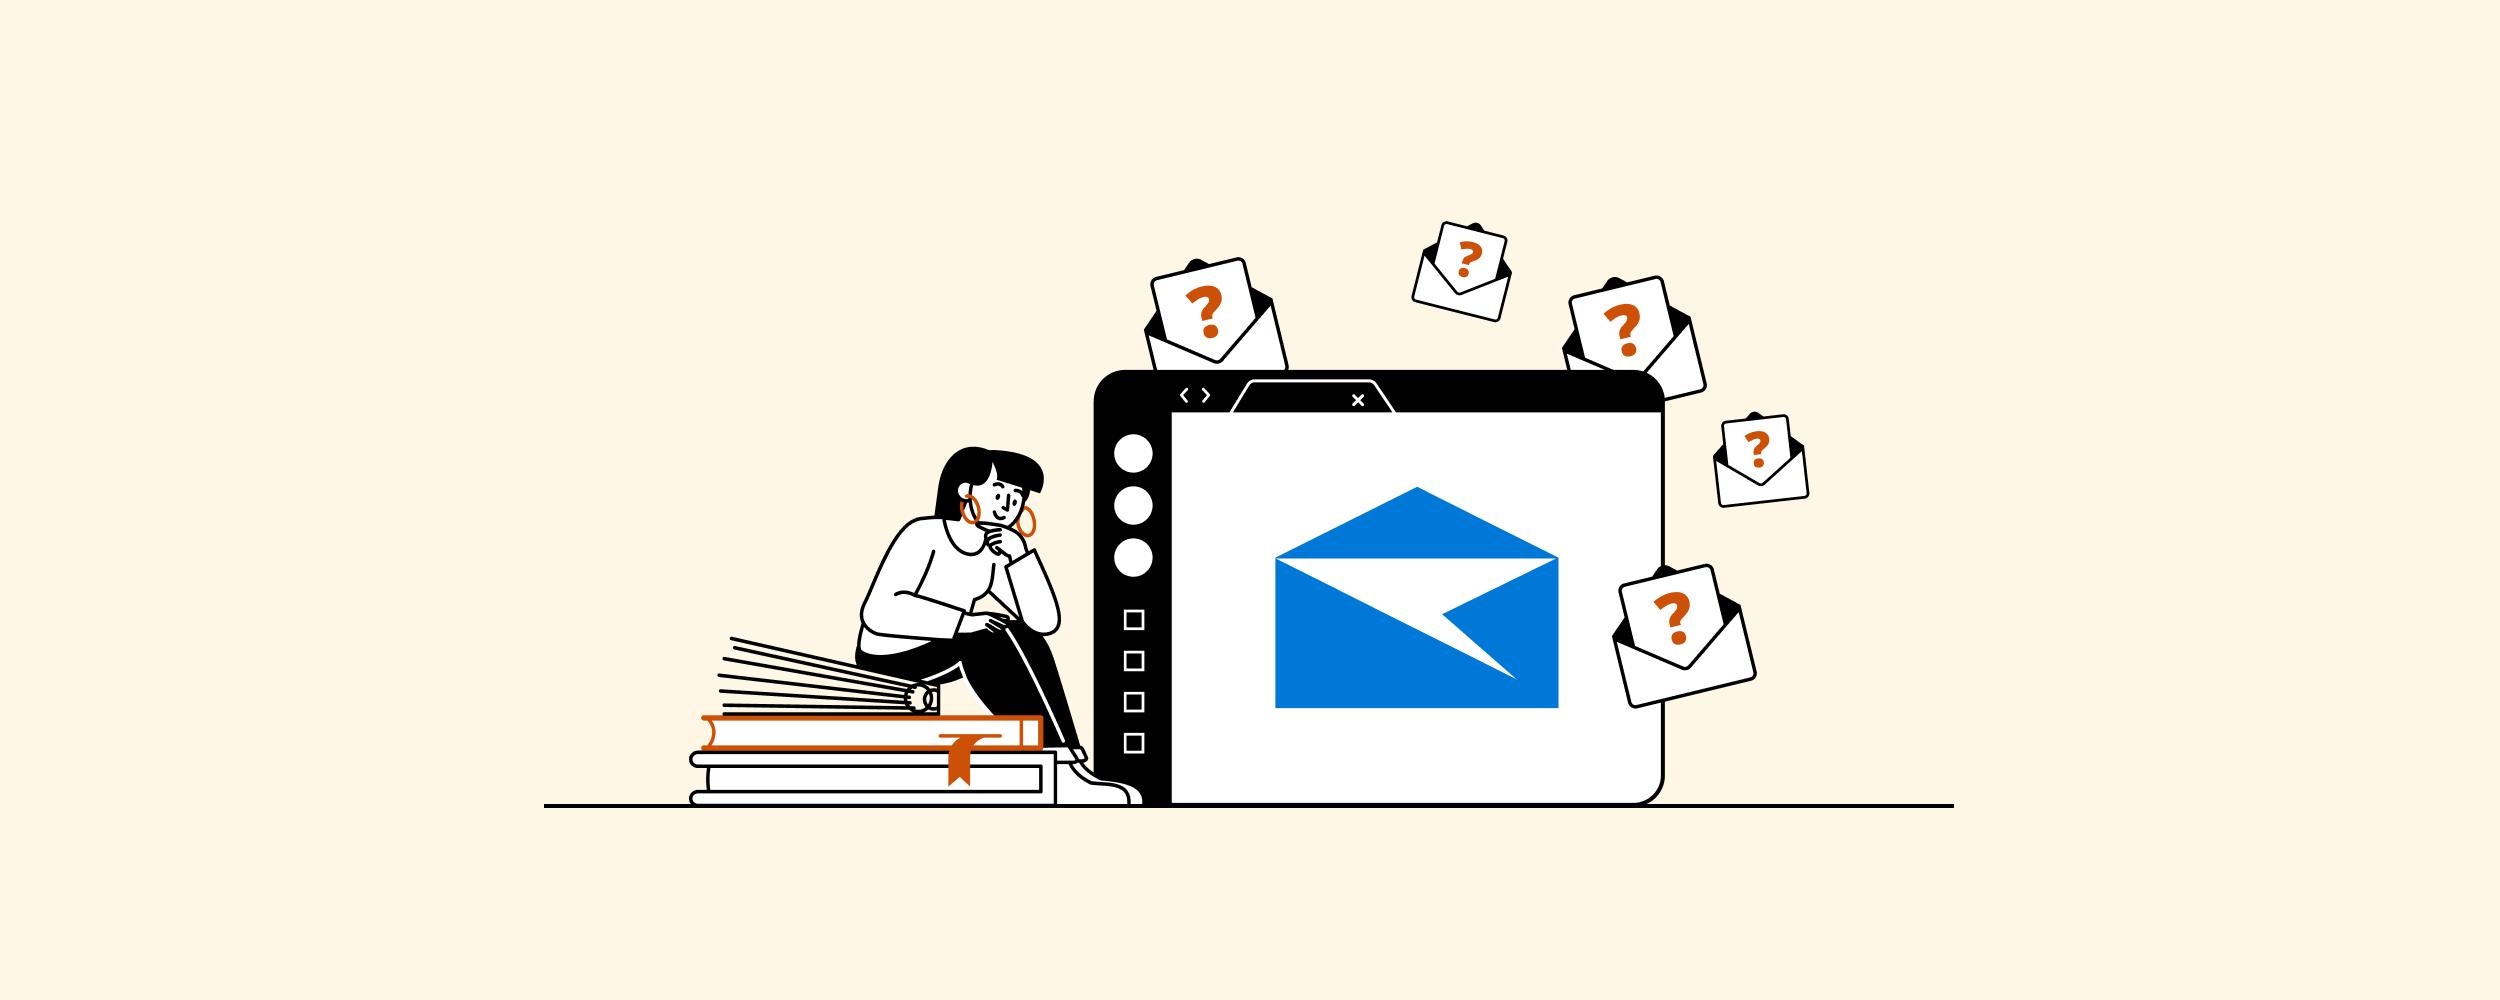 Alternative to Windows 10 Mail App